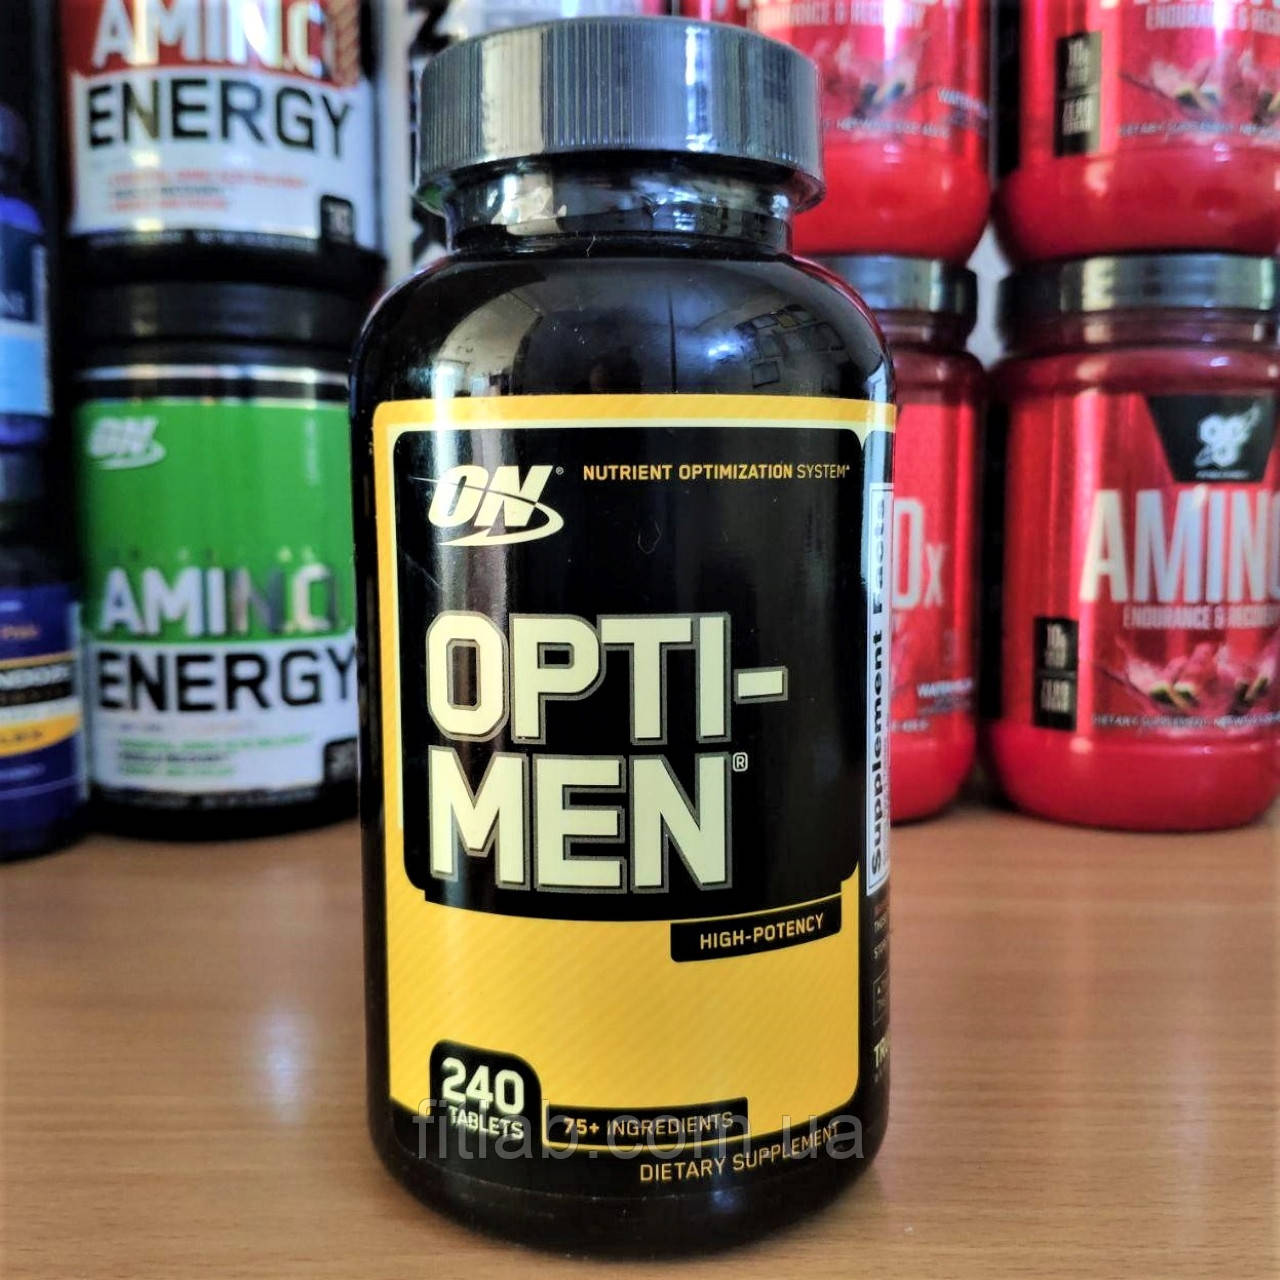 Optimum Nutrition Opti Men 240 tabs Оптимум Опти Мен Opti Men мужские спортивные витамины